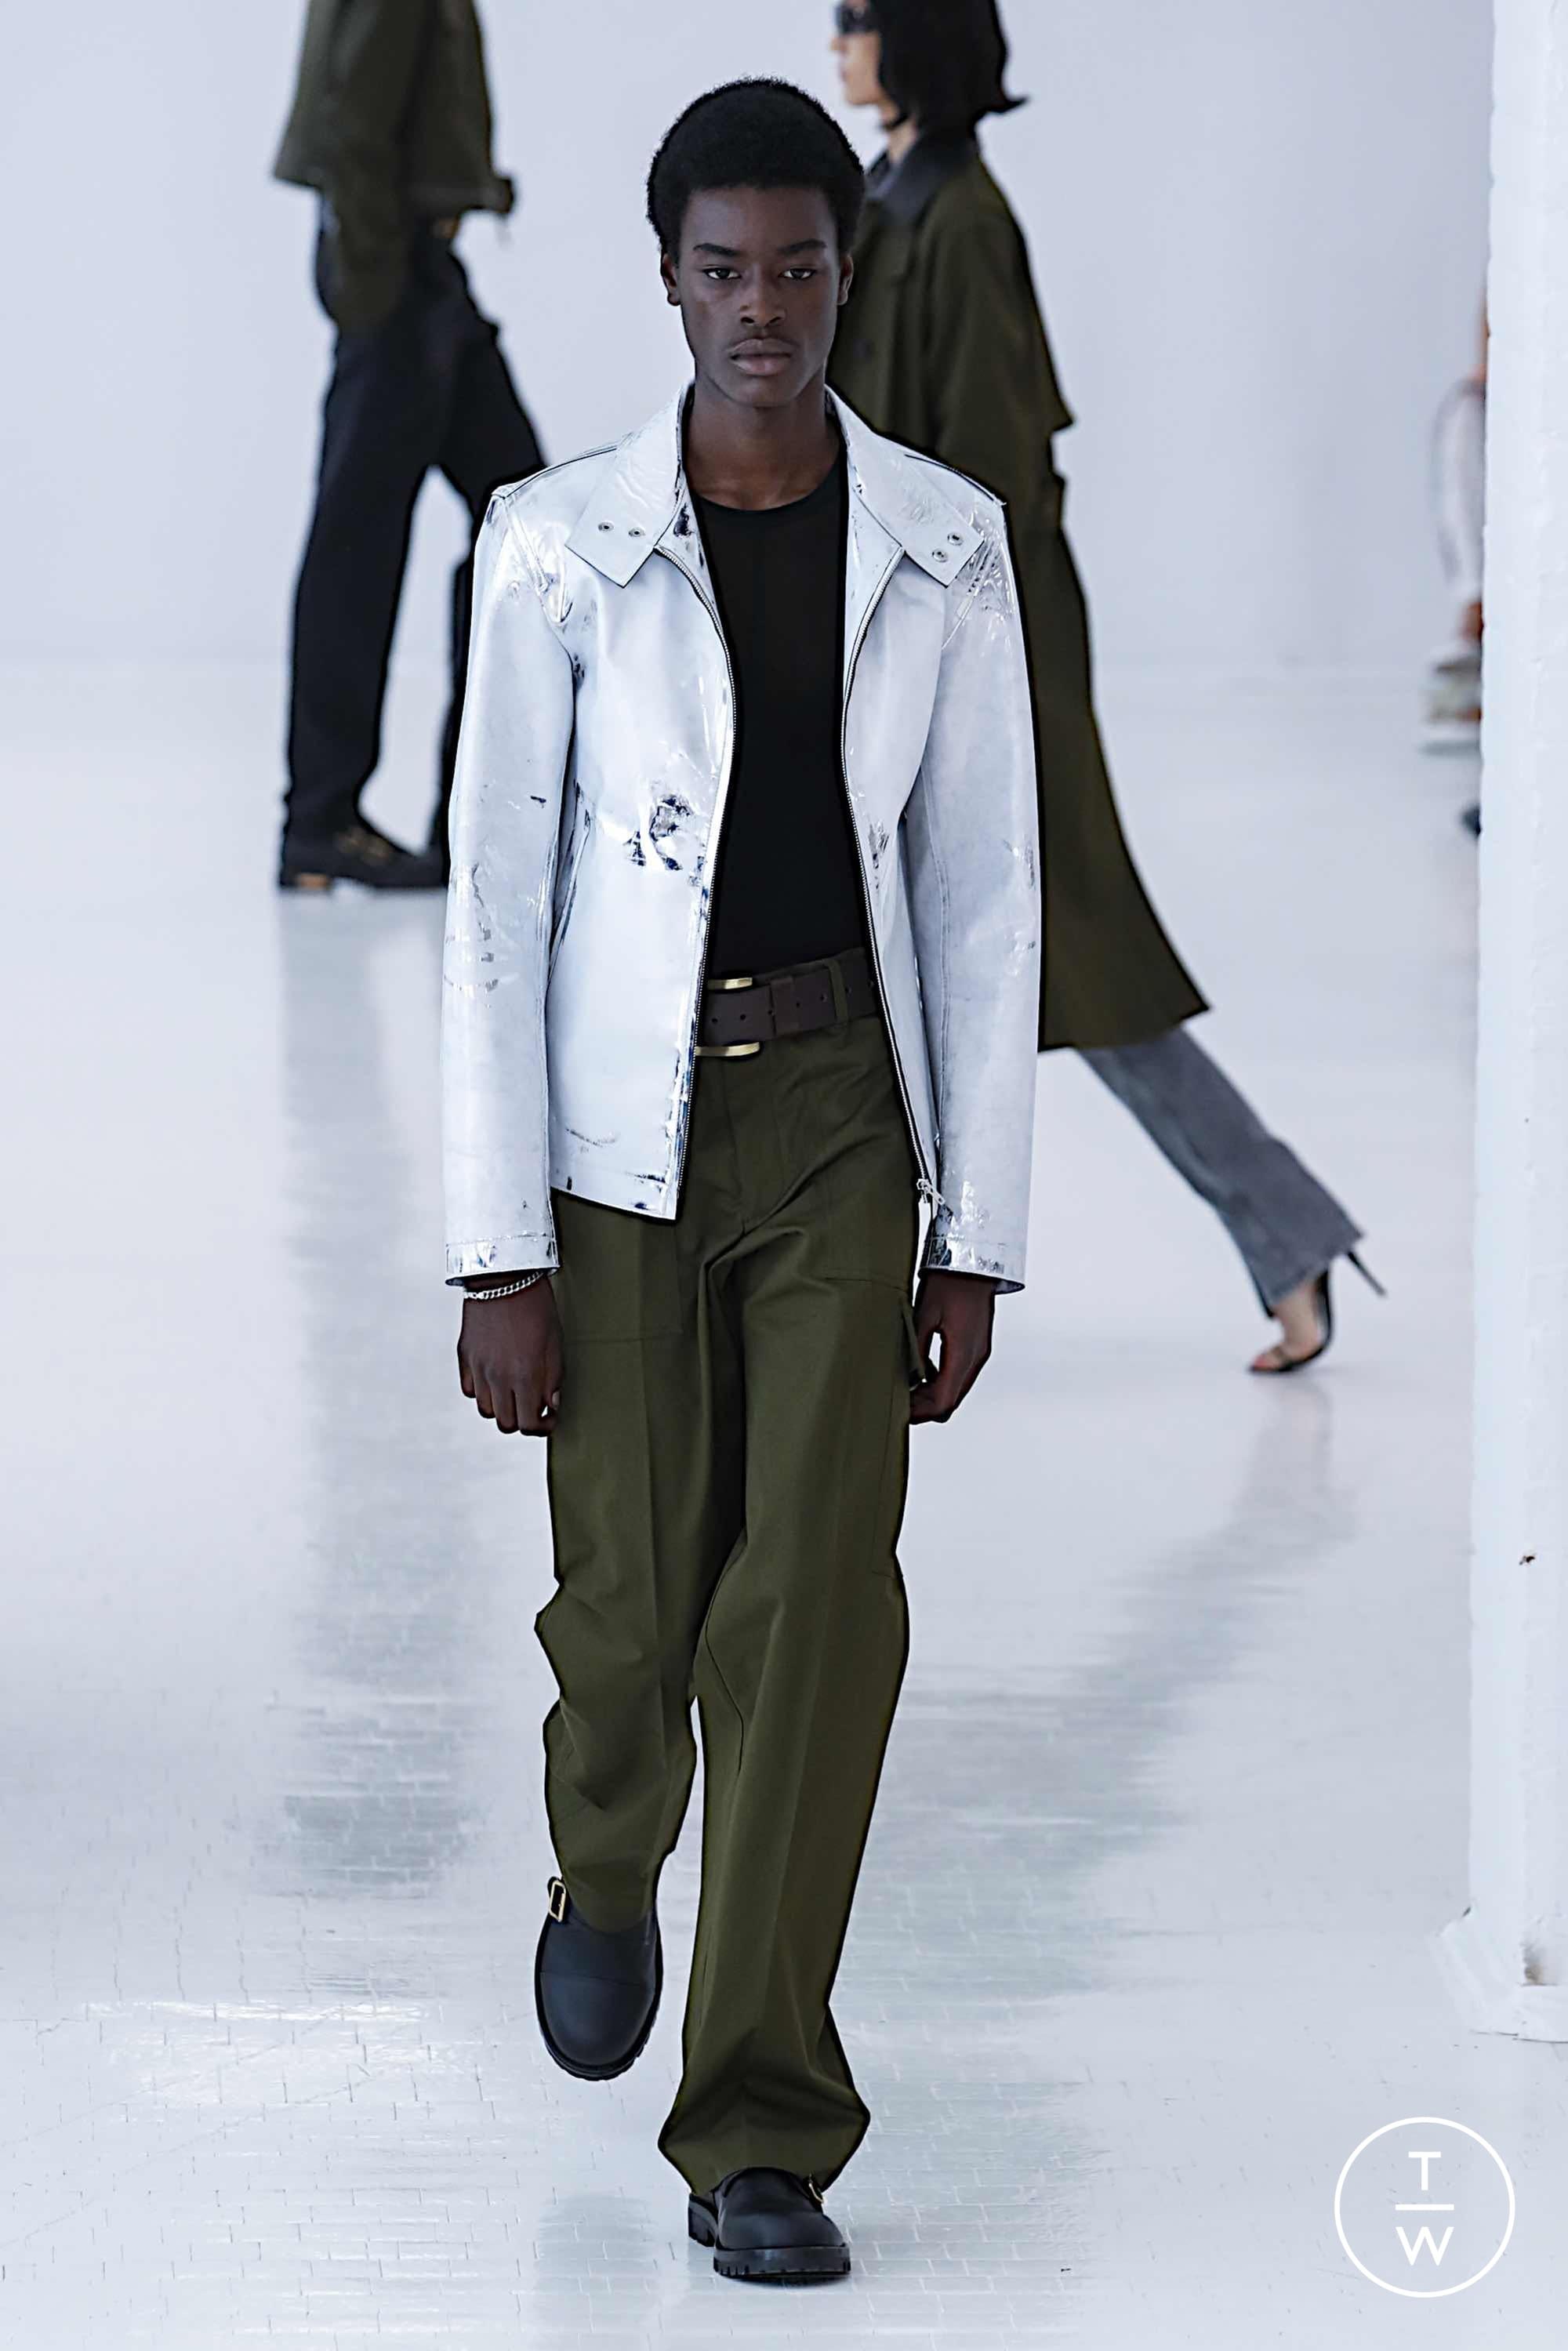 New Look Skinny Dogtooth Pantaloni Completo Uomo